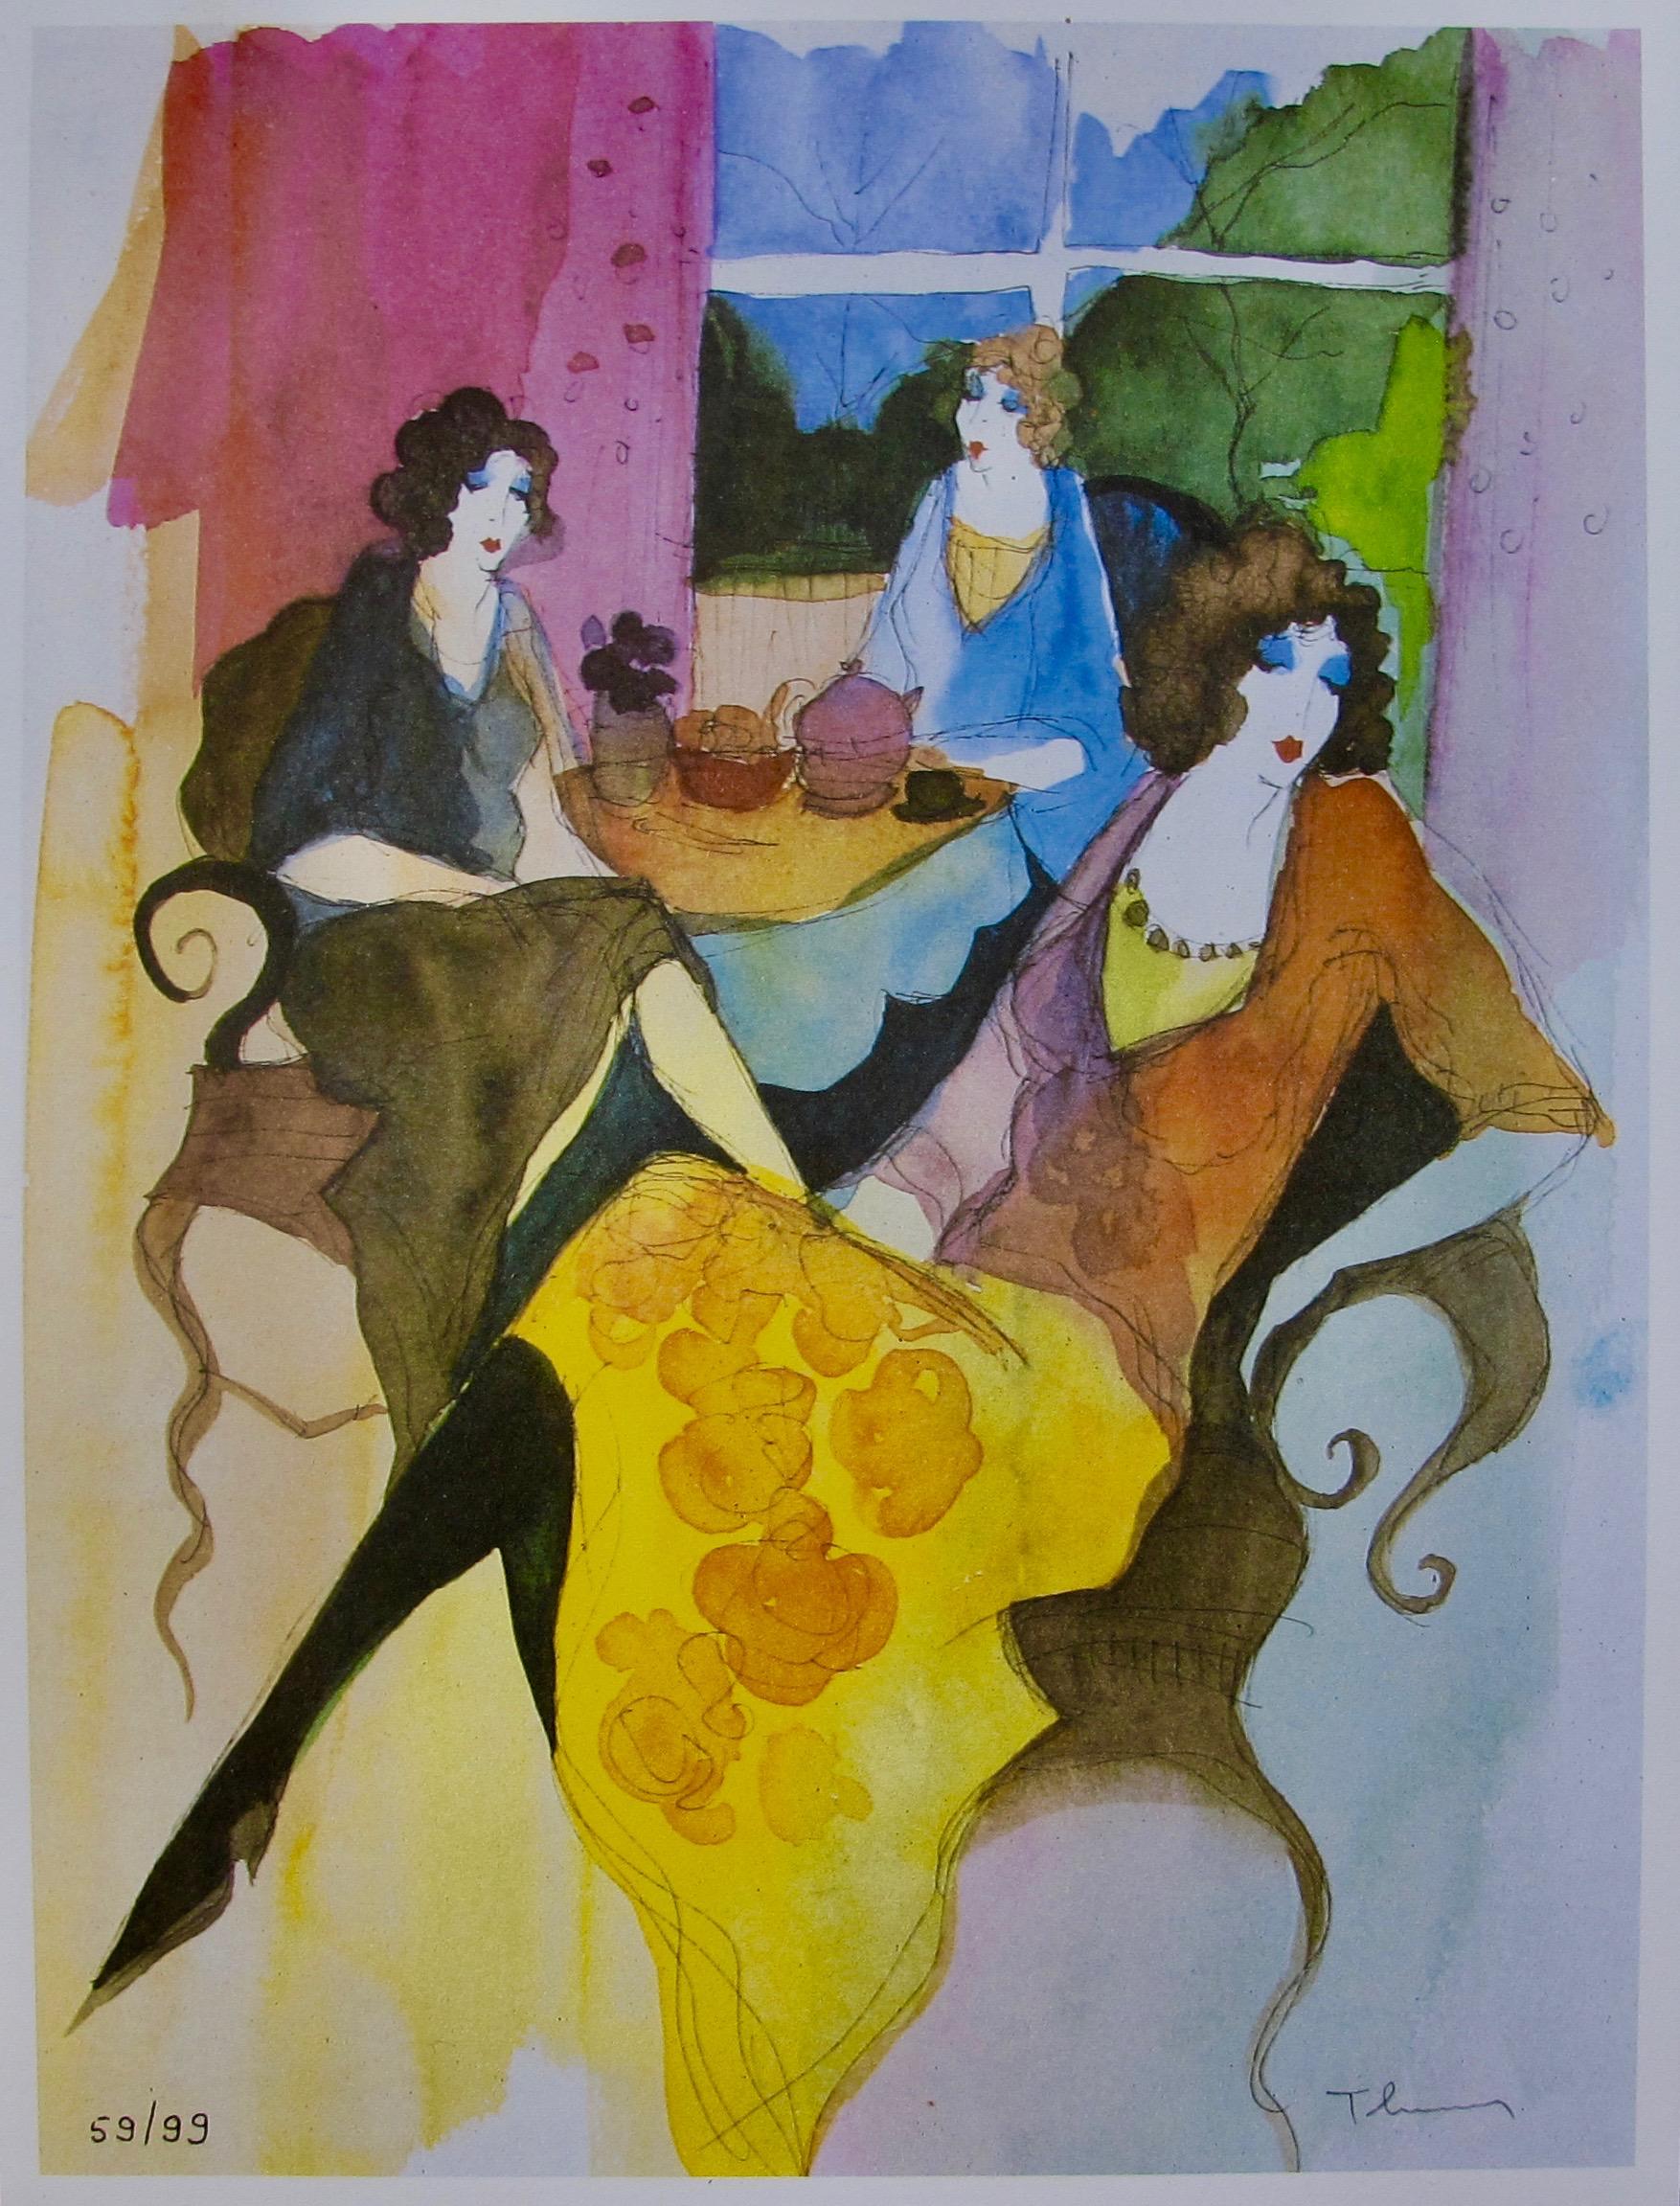 Itzchak Tarkay DISREGARDING Facsimile Signed Limited Edition Original Lithograph Art